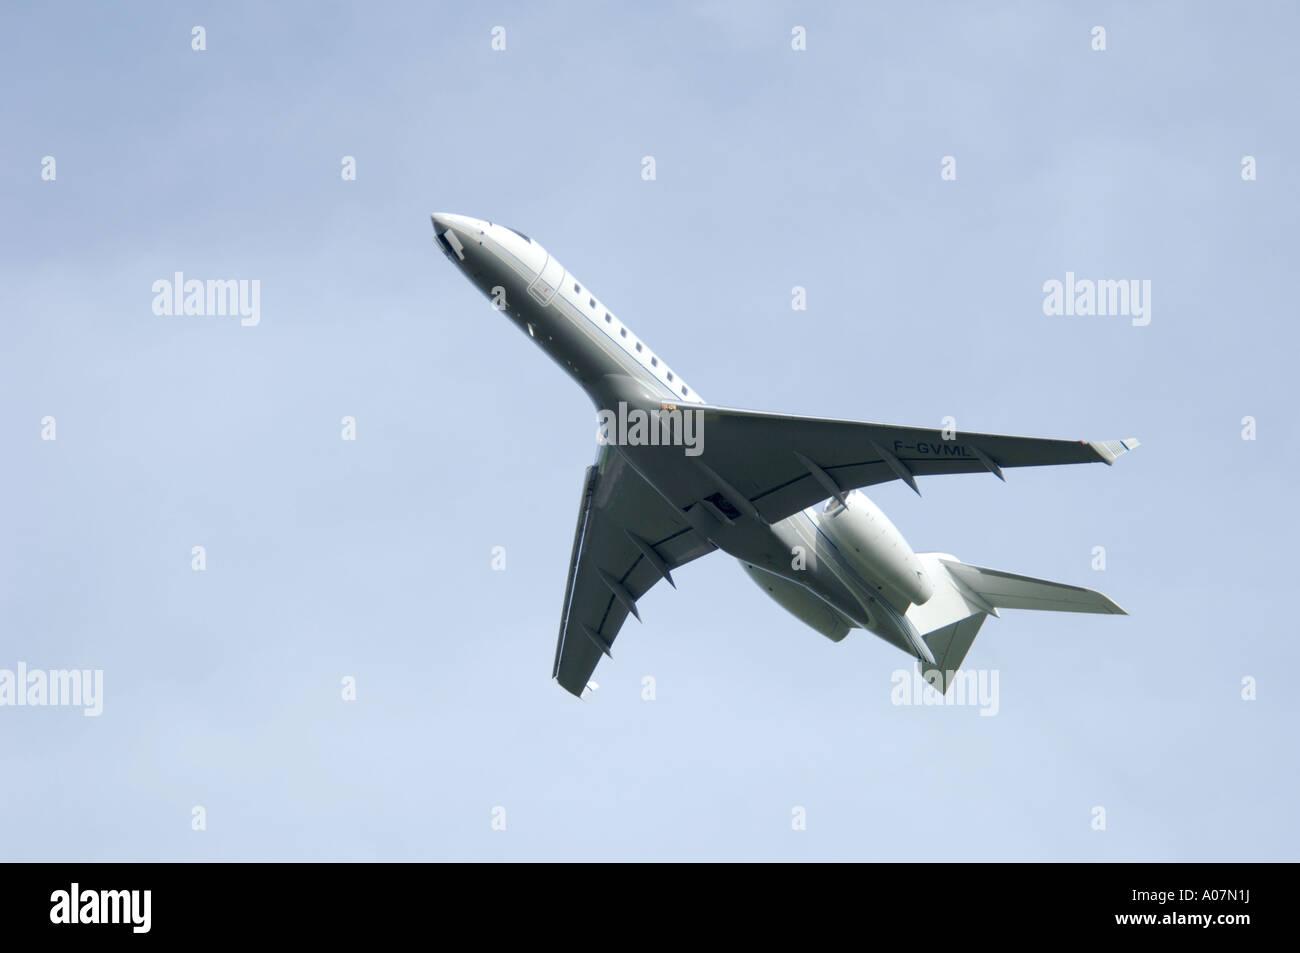 Dassault Falcon 900 super large Tri Jet departing Inverness Dalcross Airport.  XAV 3991-380 Stock Photo